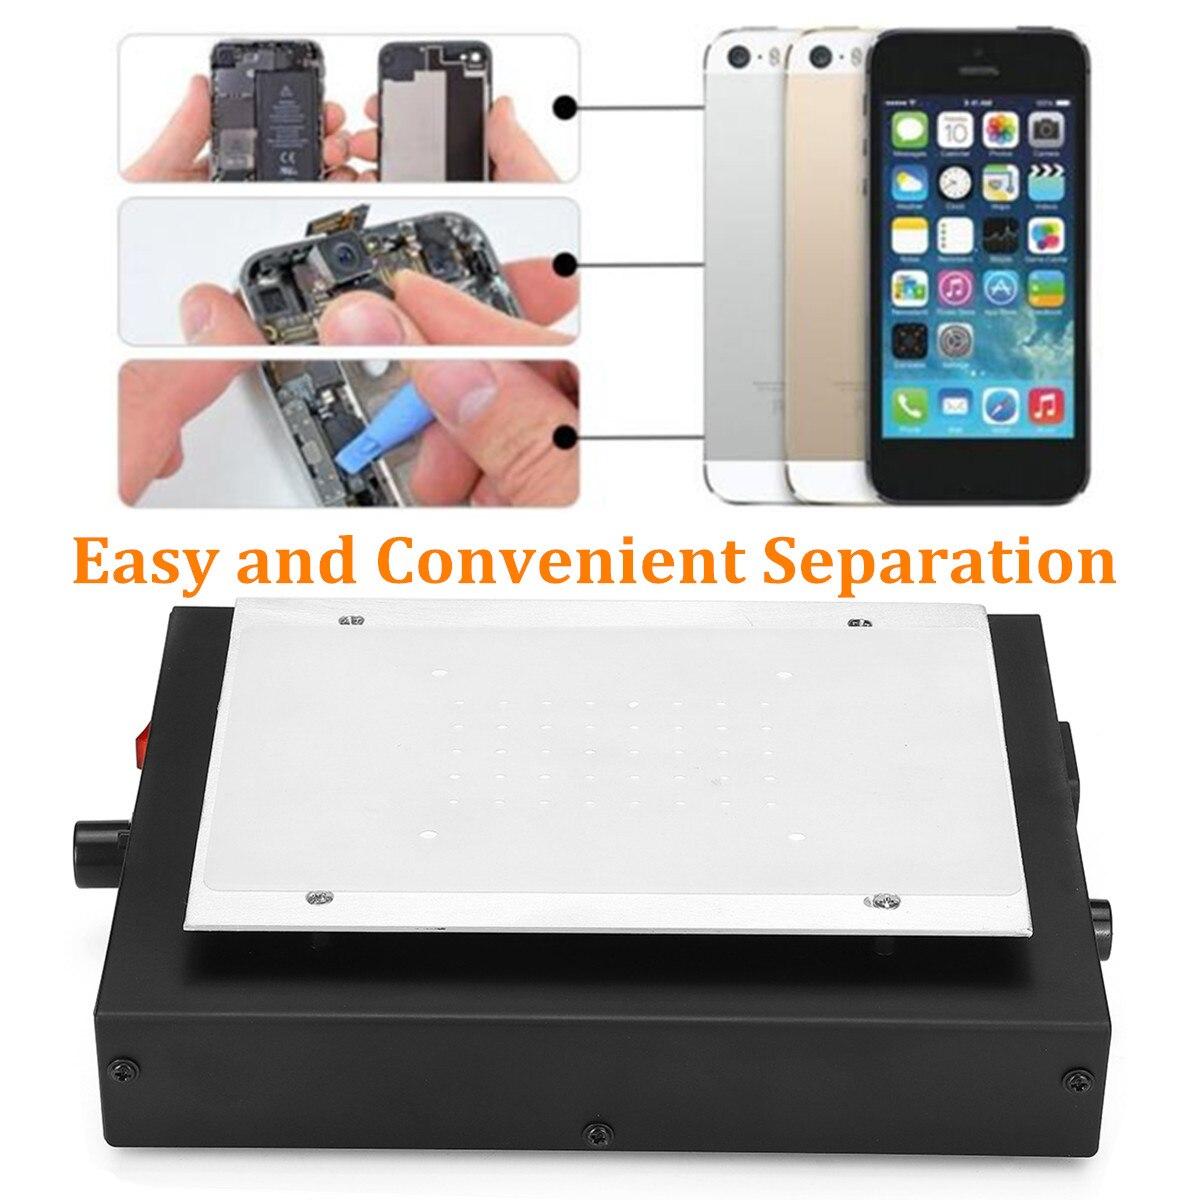 Doersupp Screen Separator Auto Heating Metal Phone Repair Machine Glass Removal Heating Platform Plate LCD Screen Separators